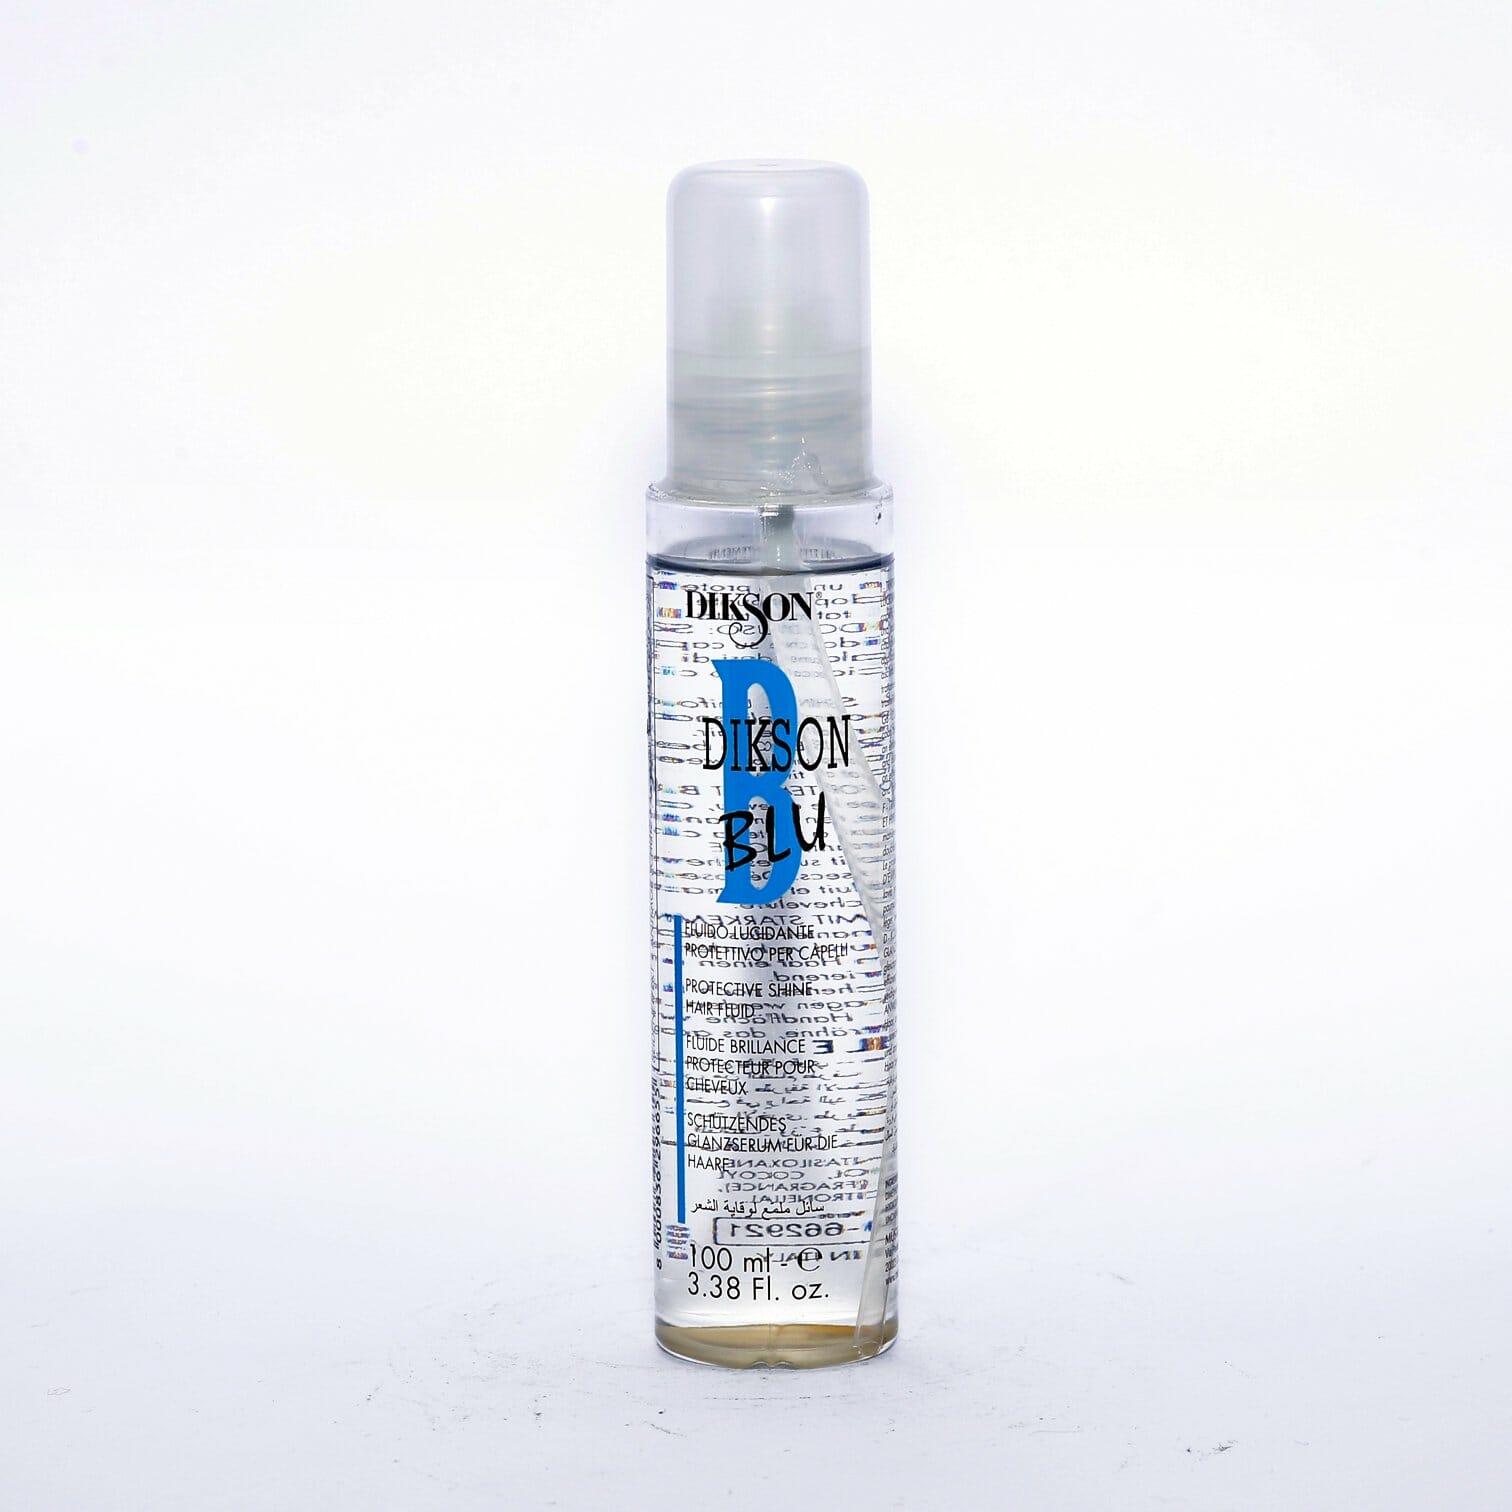 Dikson Blue Lucidante Shining Hair Spray 100ml Best Hair Spray In Pakistan